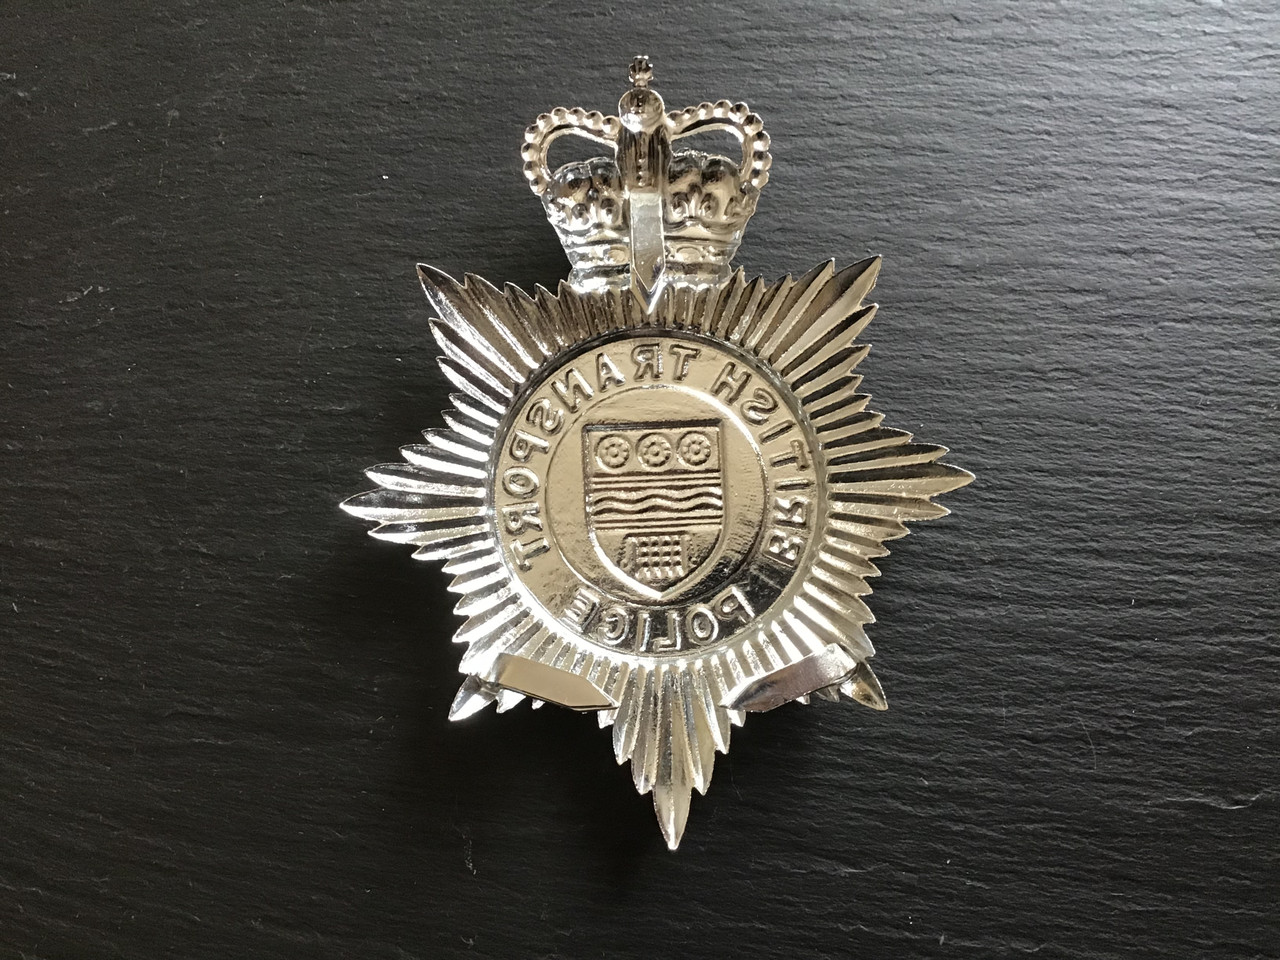 BRITISH TRANSPORT POLICE HELMET PLATE GD 977